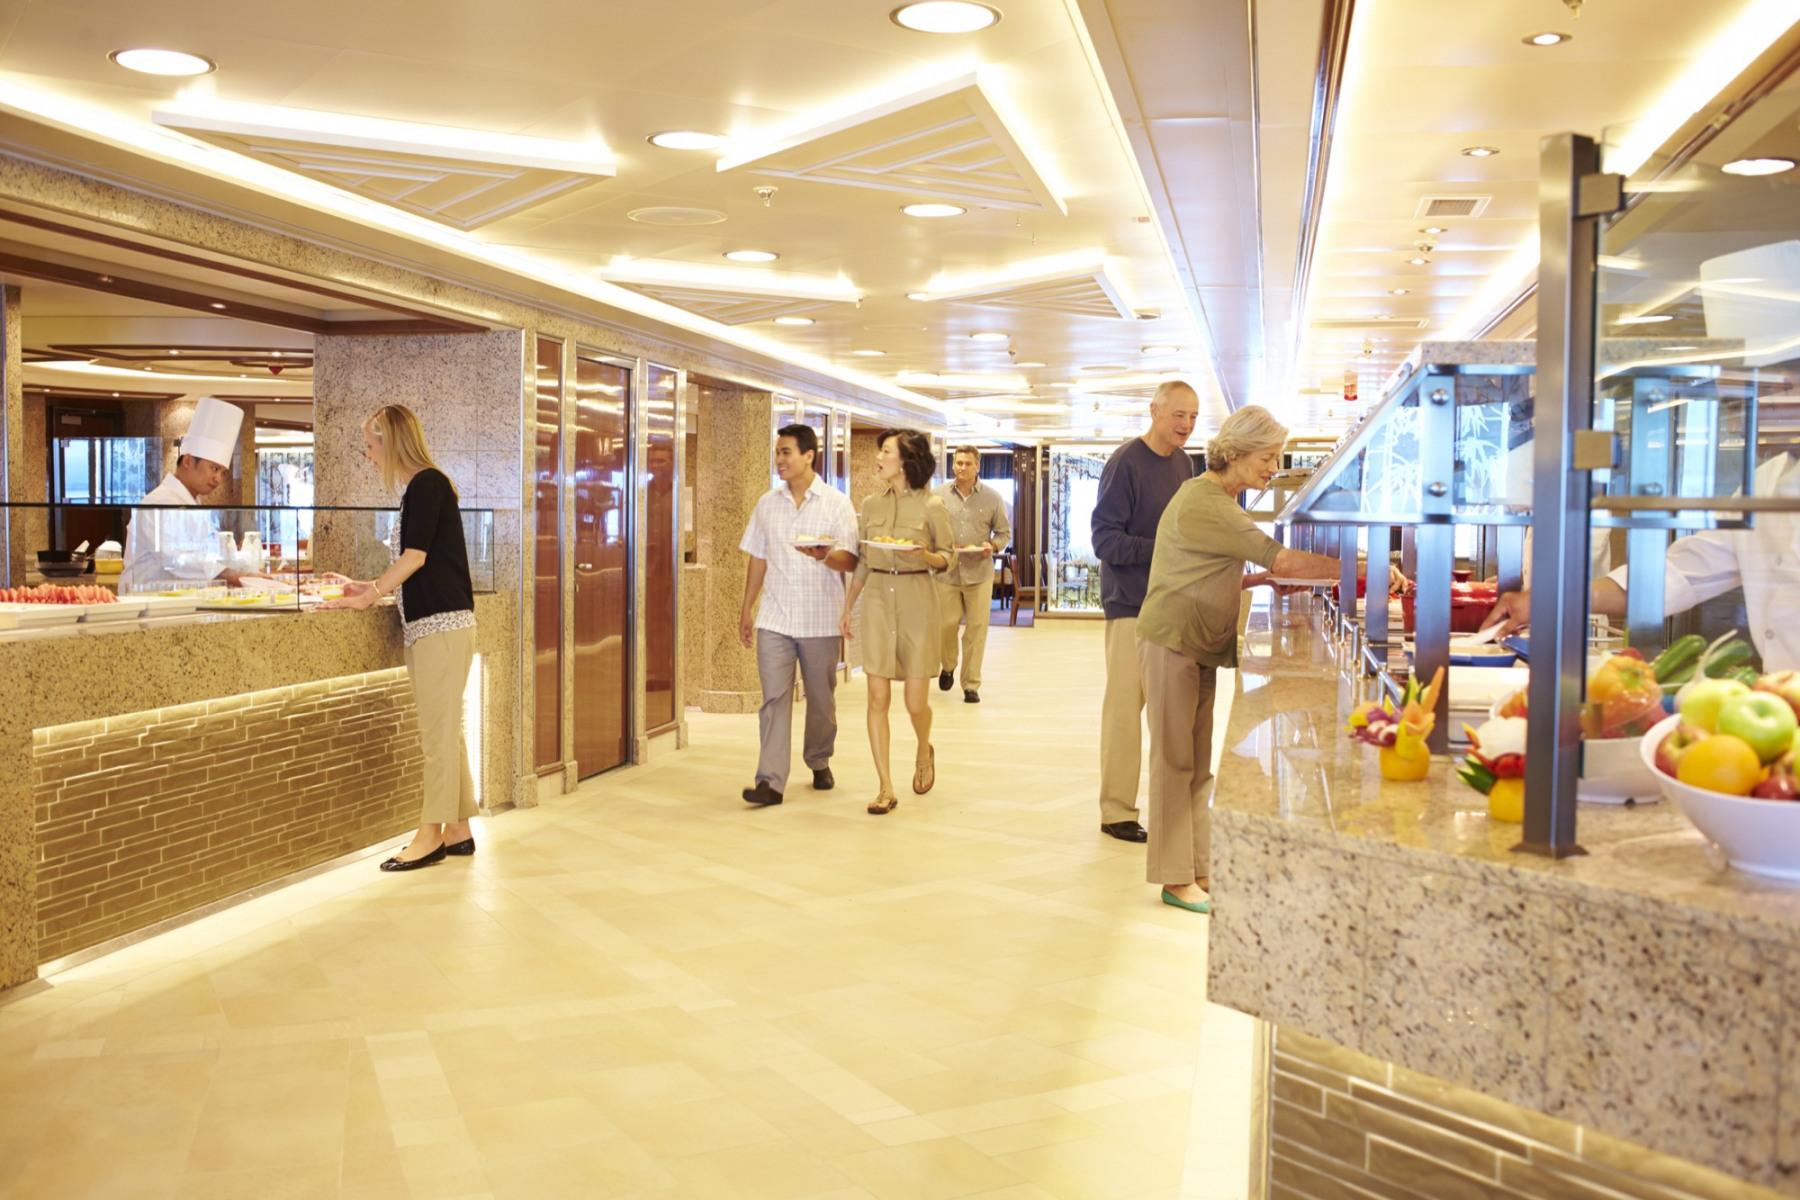 Princess Cruises Royal Class Interior Horizon Court.jpg